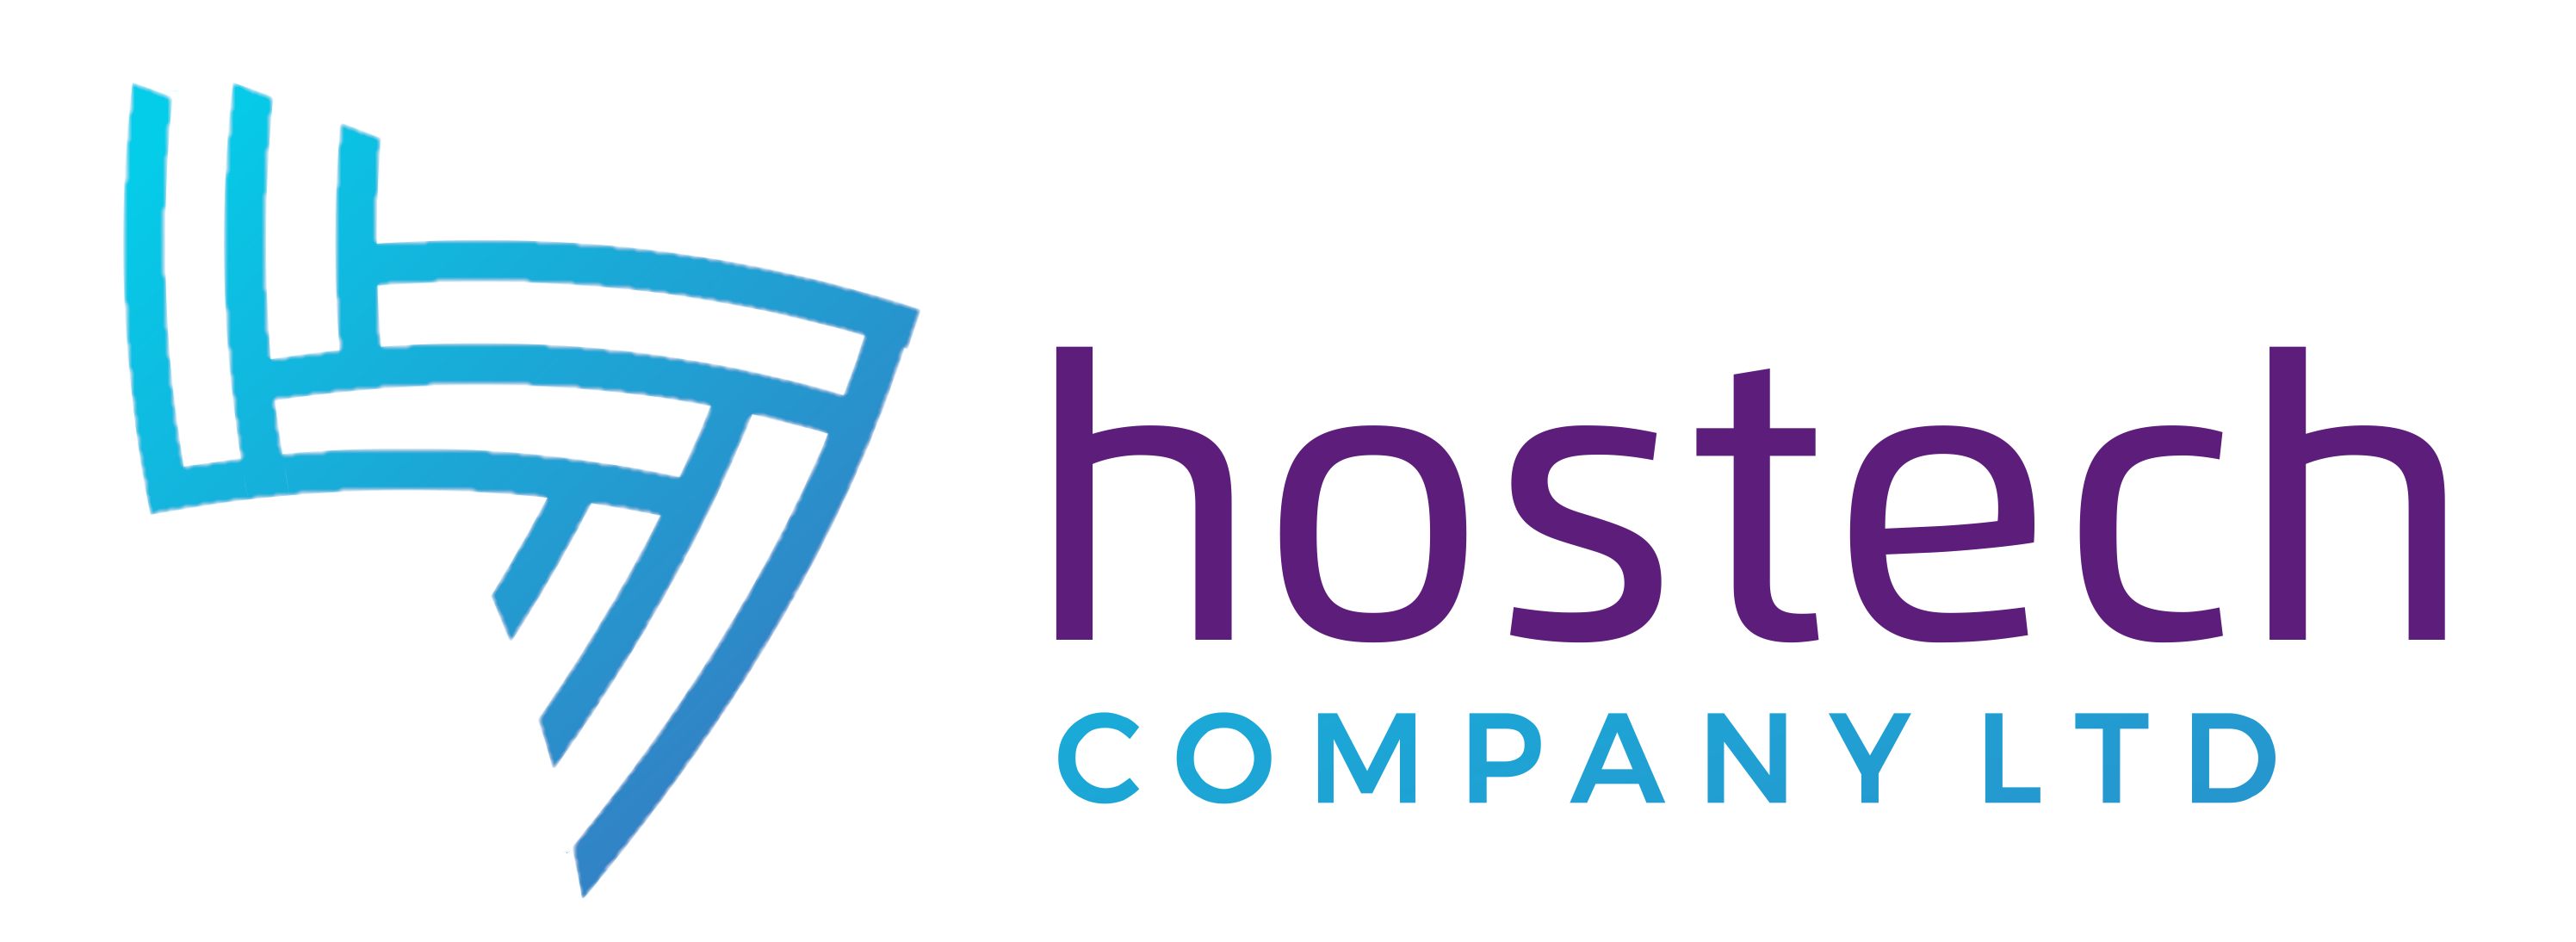 HOSTECH COMPANY LTD